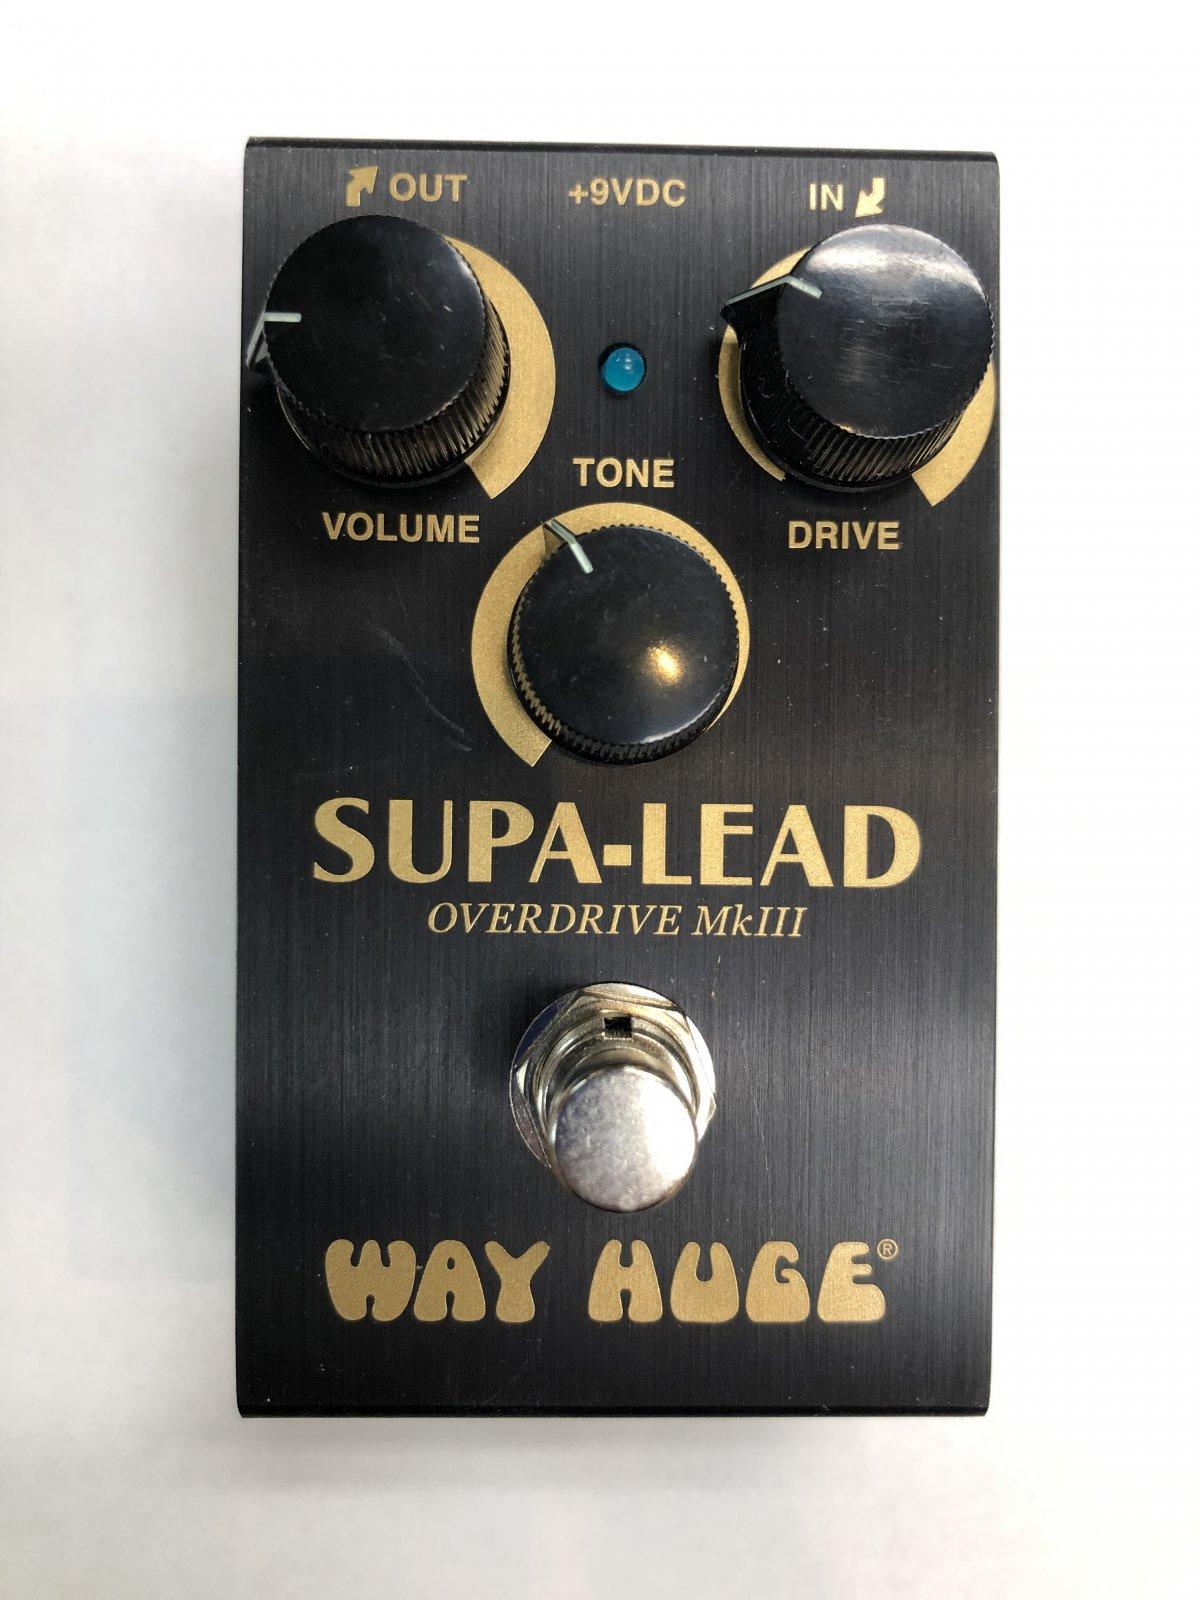 Way Huge Supa-Lead Overdrive MkIII - USED